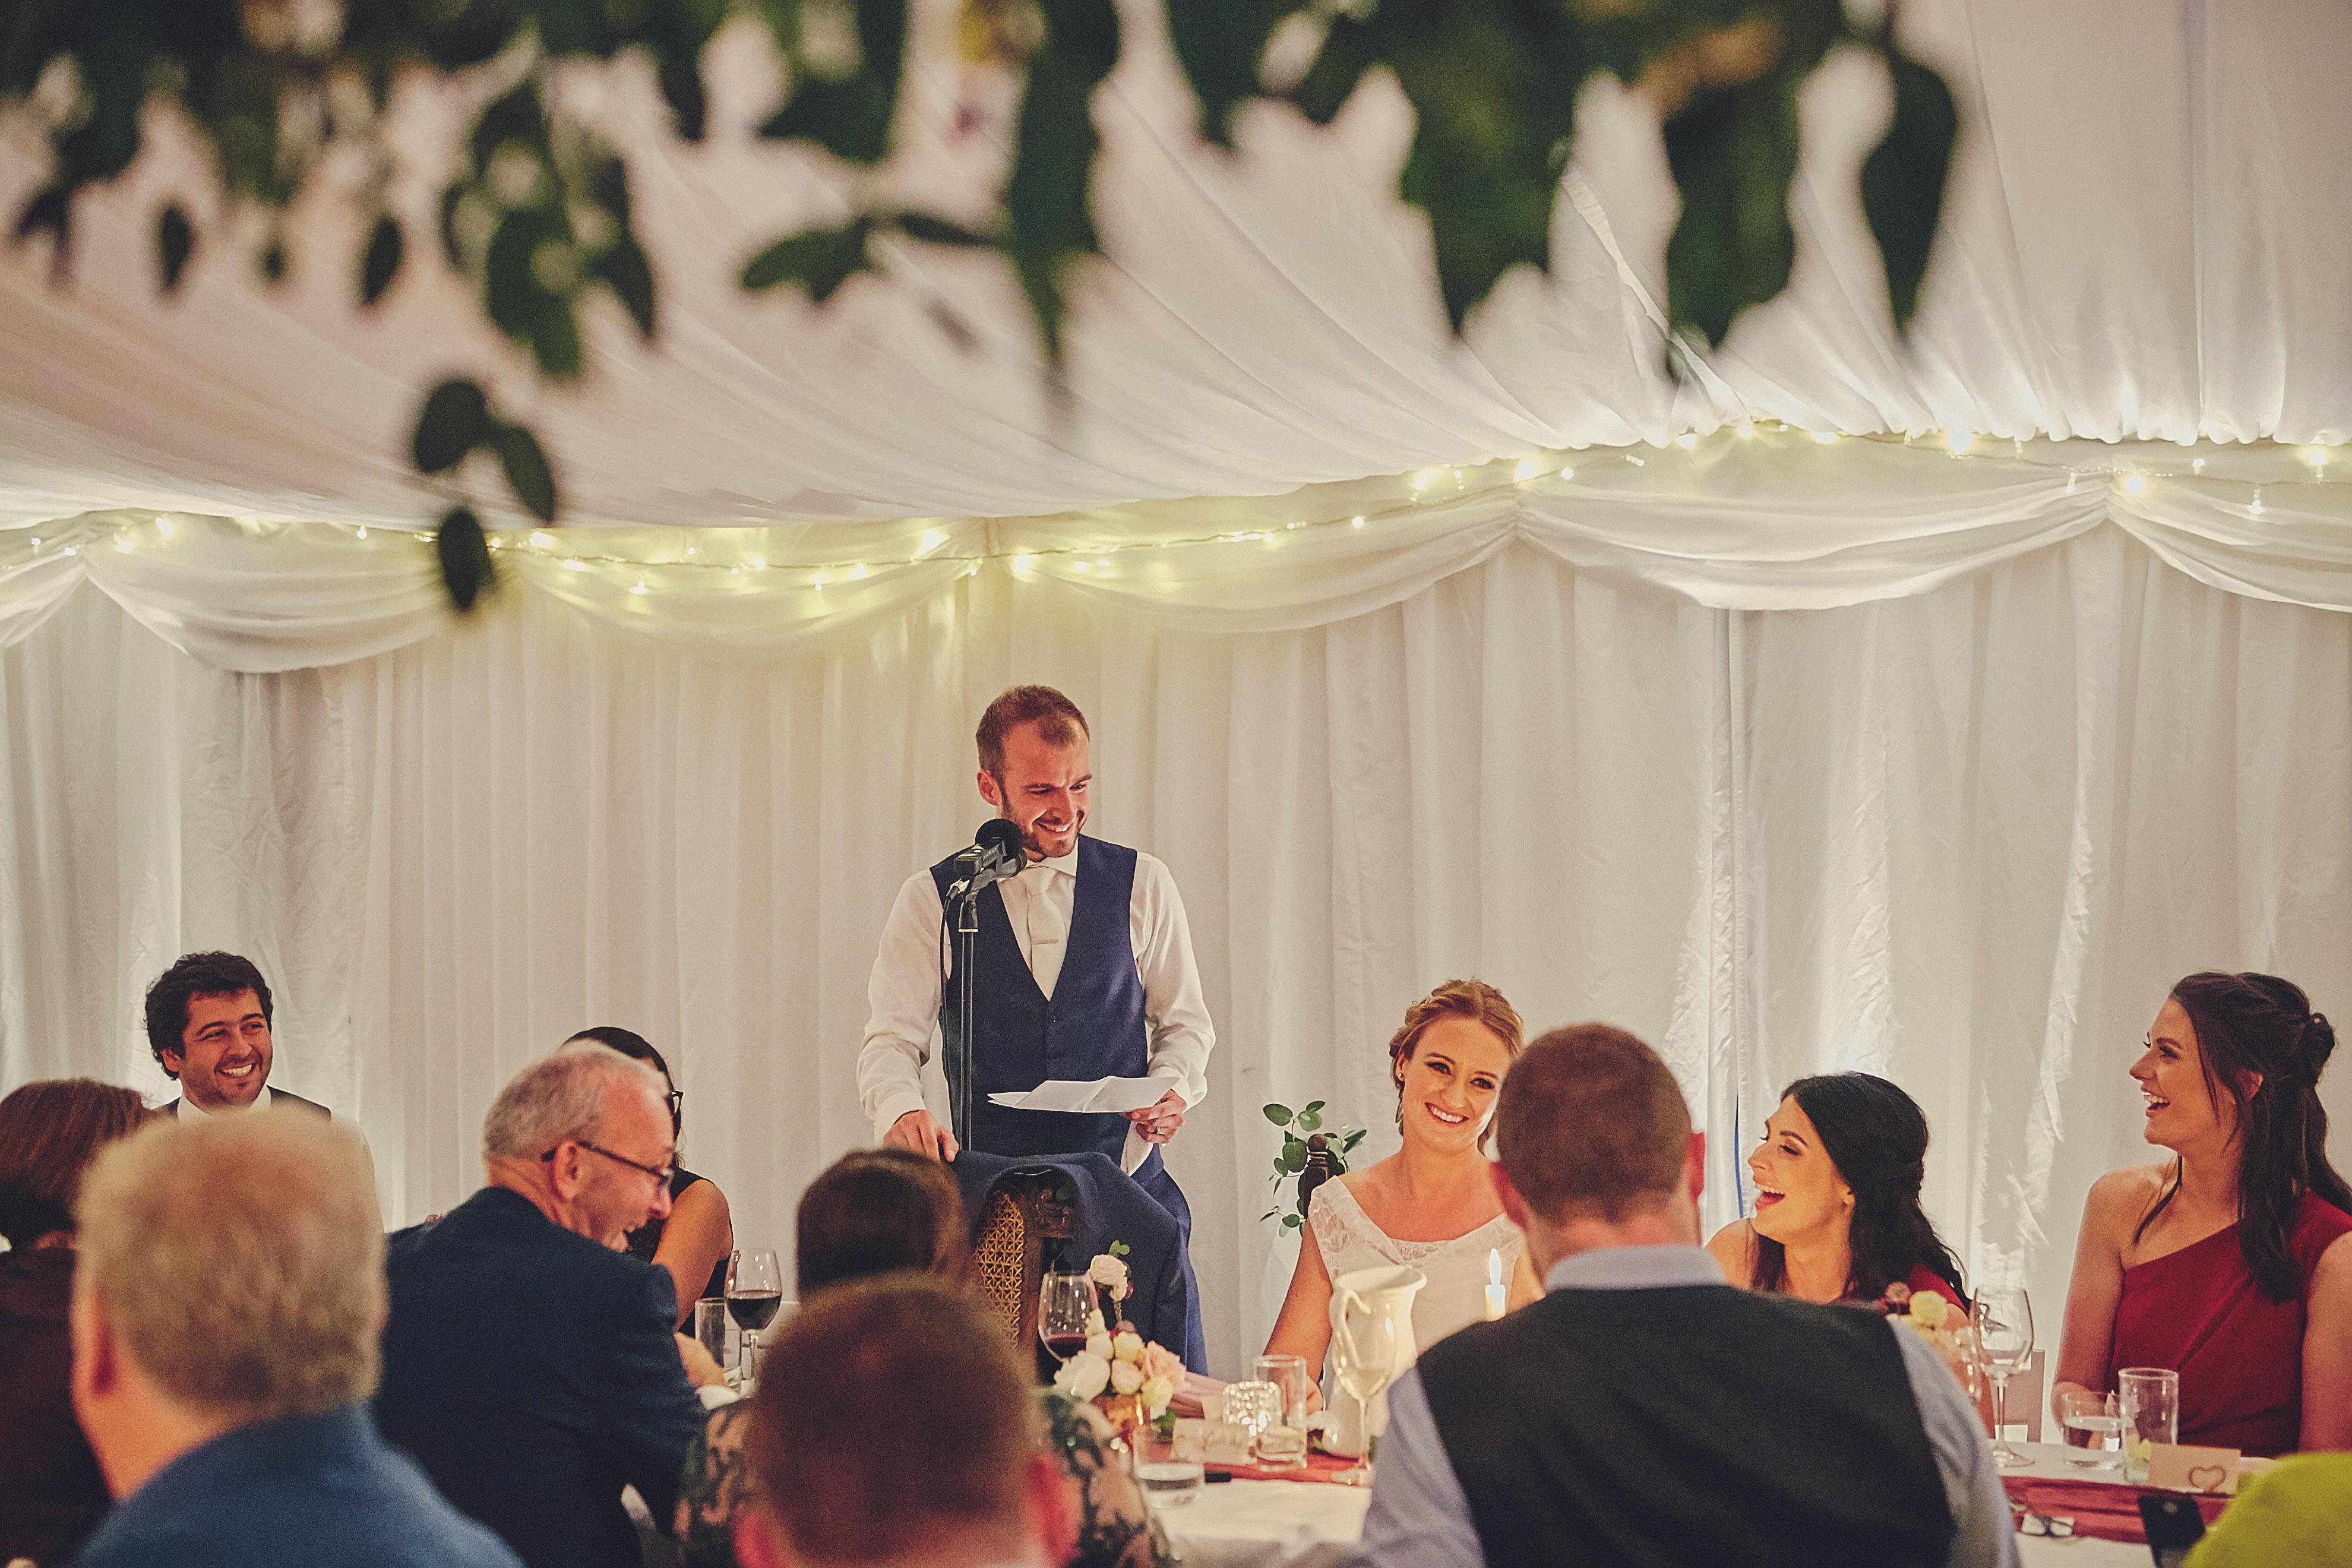 Cloughjordan House weddding144 - Cloughjordan House Wedding - Alternative Venue